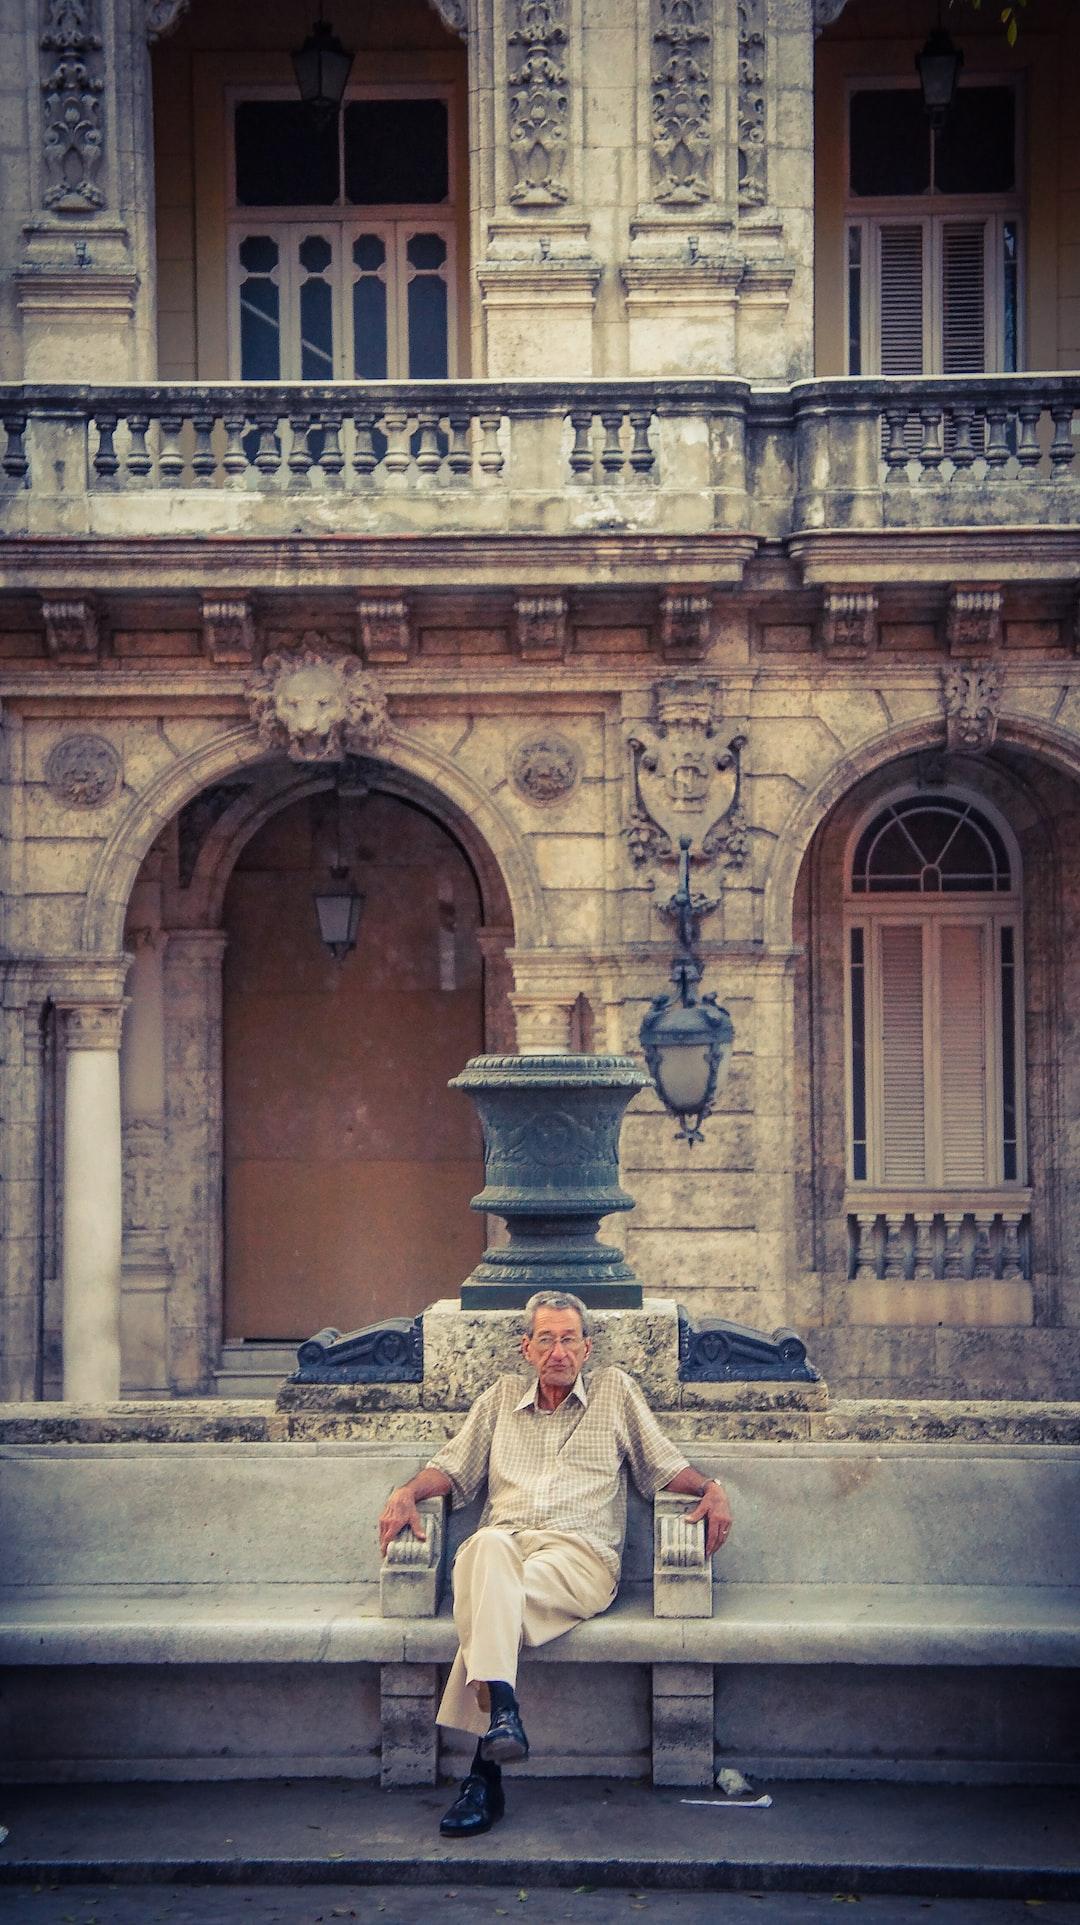 Thinking - La havana / Cuba